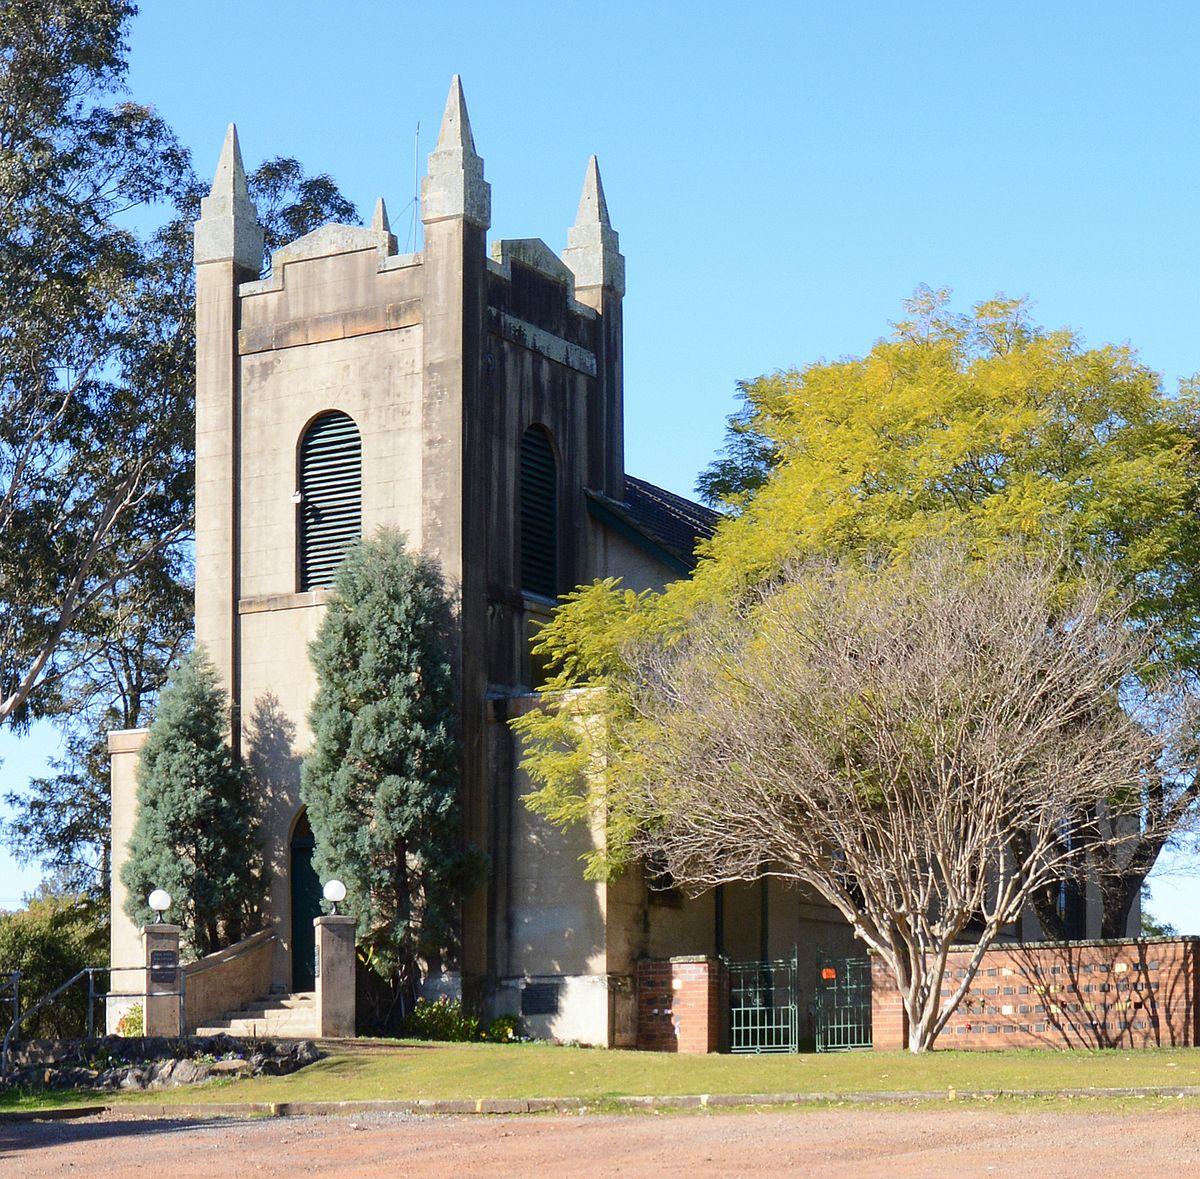 St Marys, New South Wales - Wikipedia